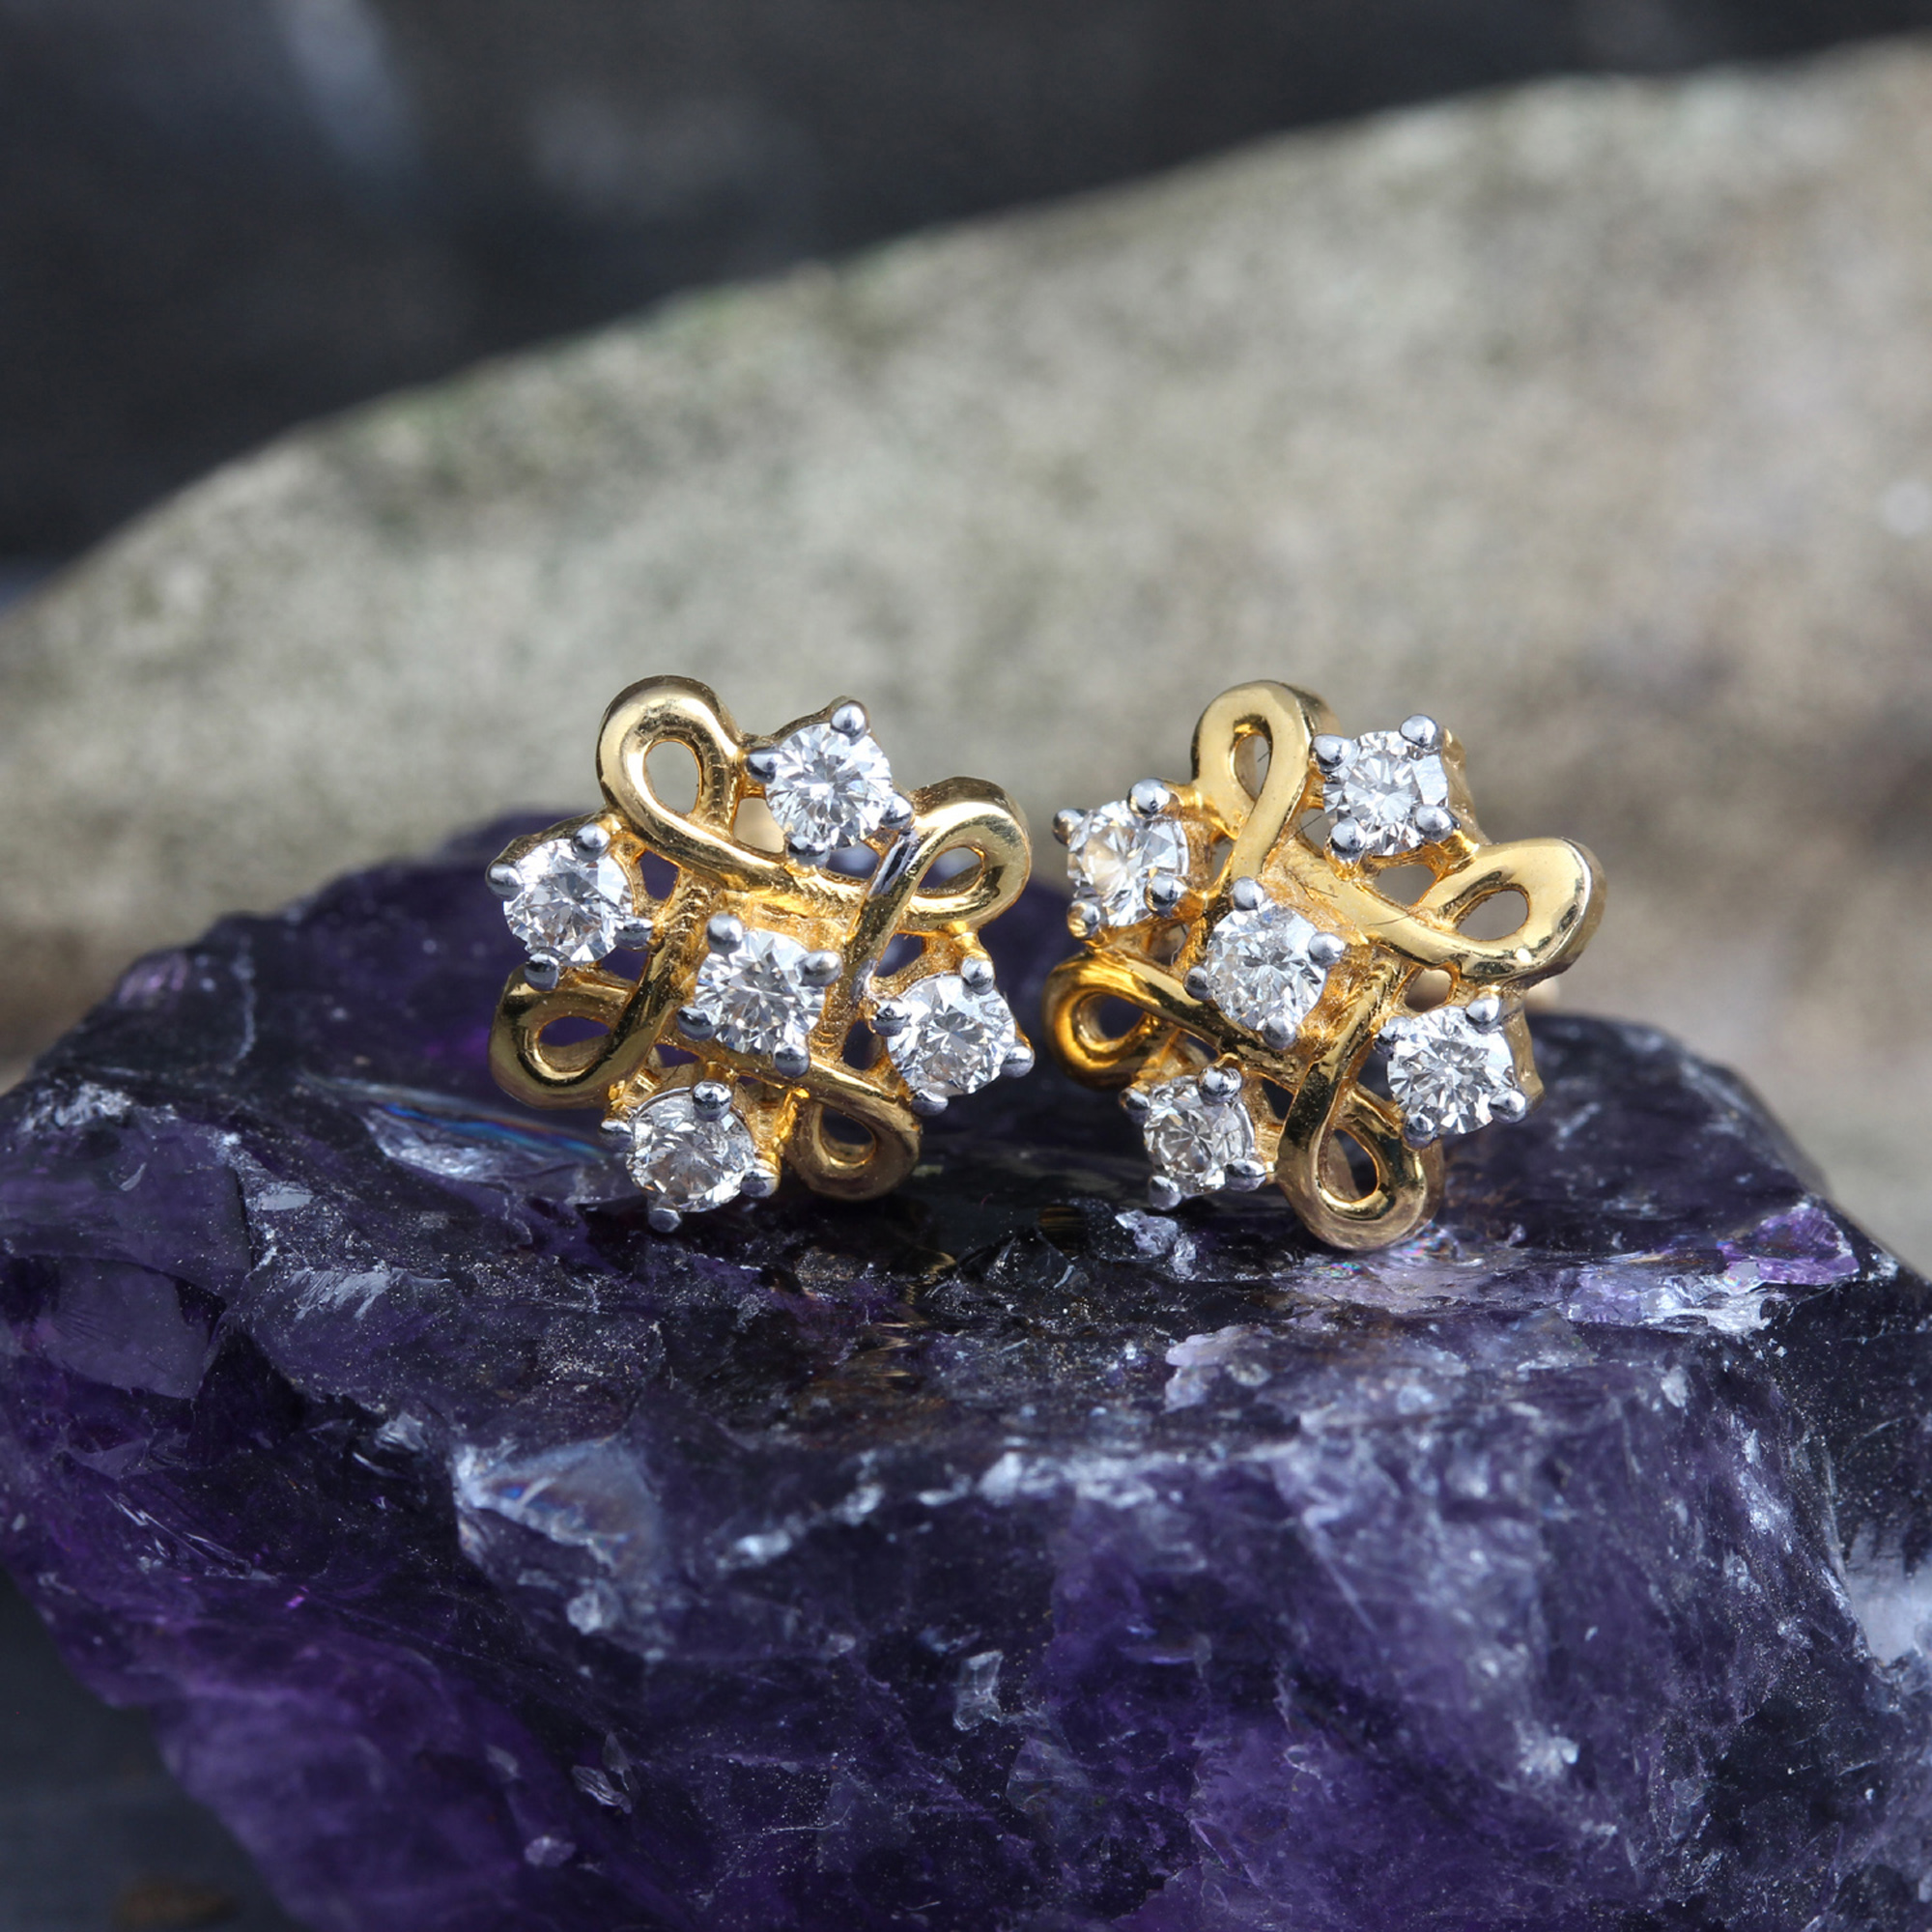 14k Gold Stud Earrings with Diamonds